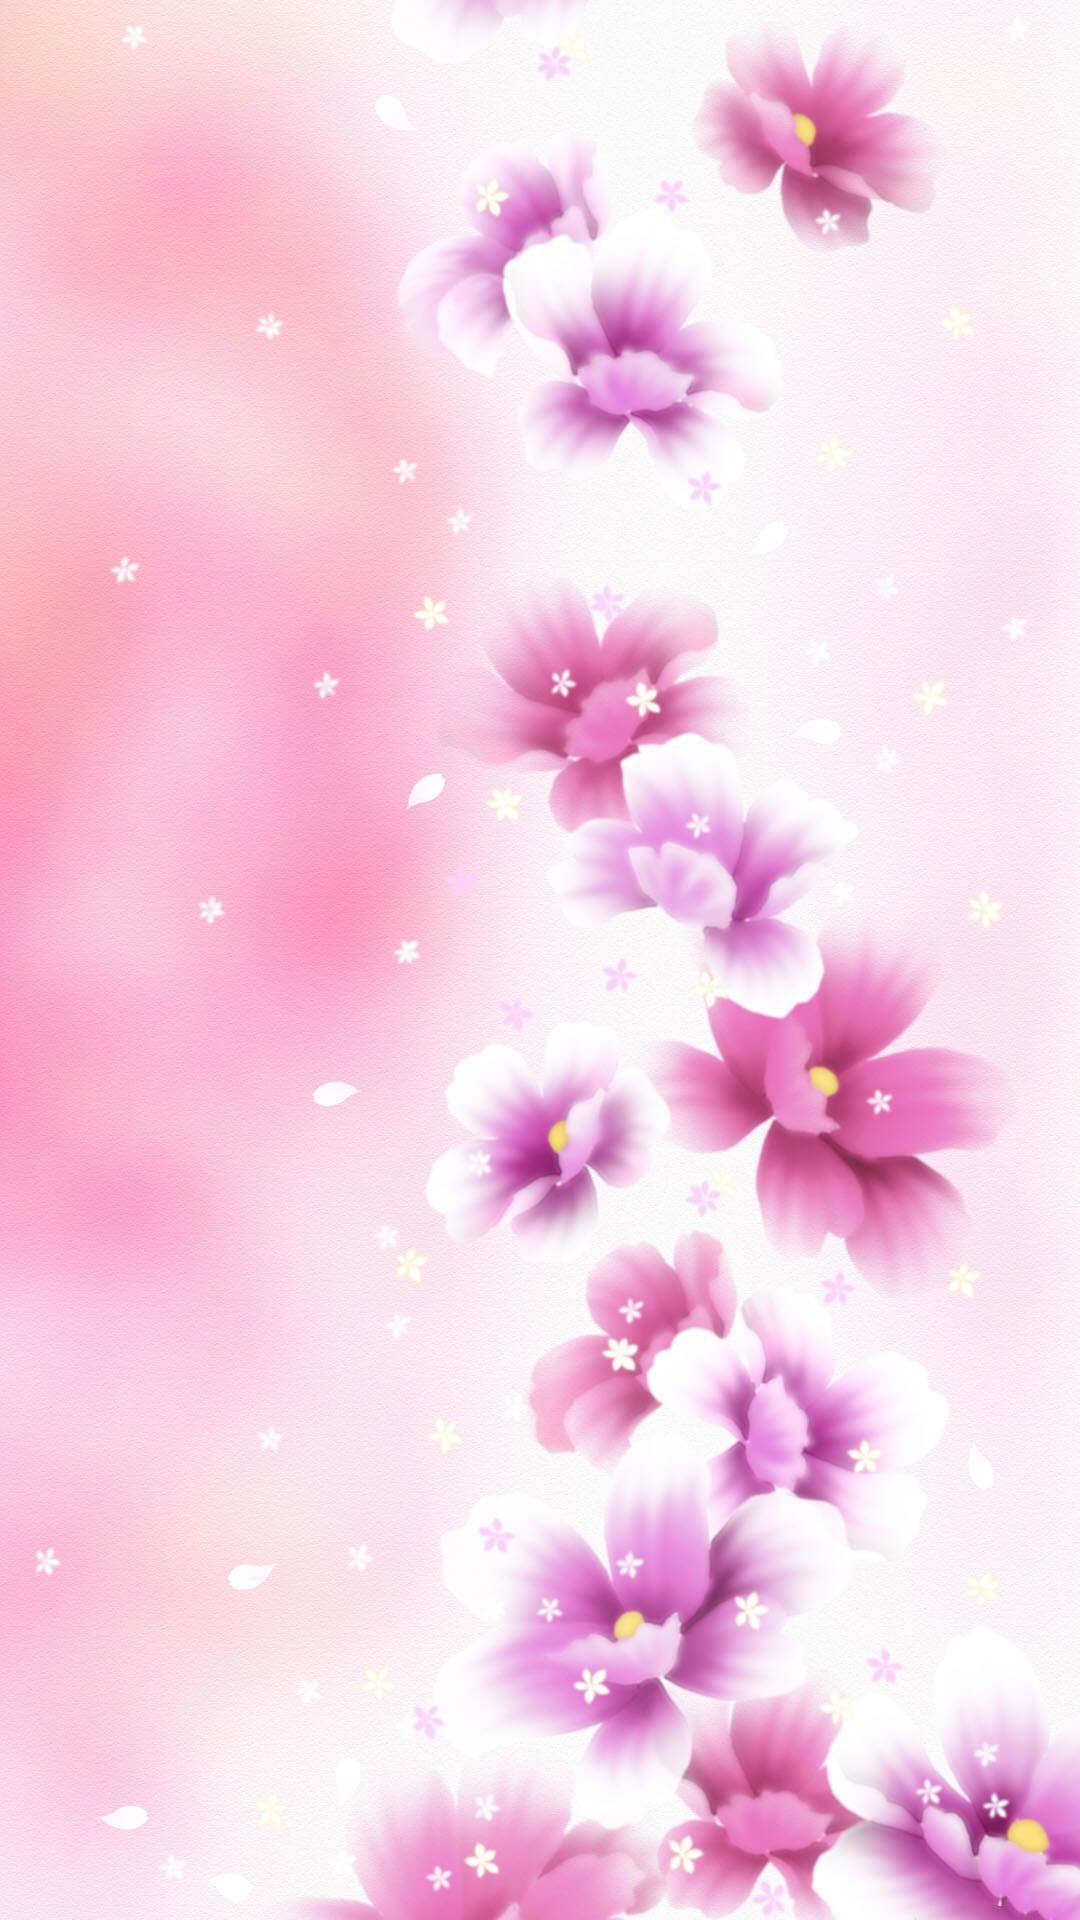 Iphone 6 wallpaper tumblr flower - Iphone 6 Backgrounds Tumblr Girly Cool Iphone Backgrounds Girly Hd Wallpaper Iphone